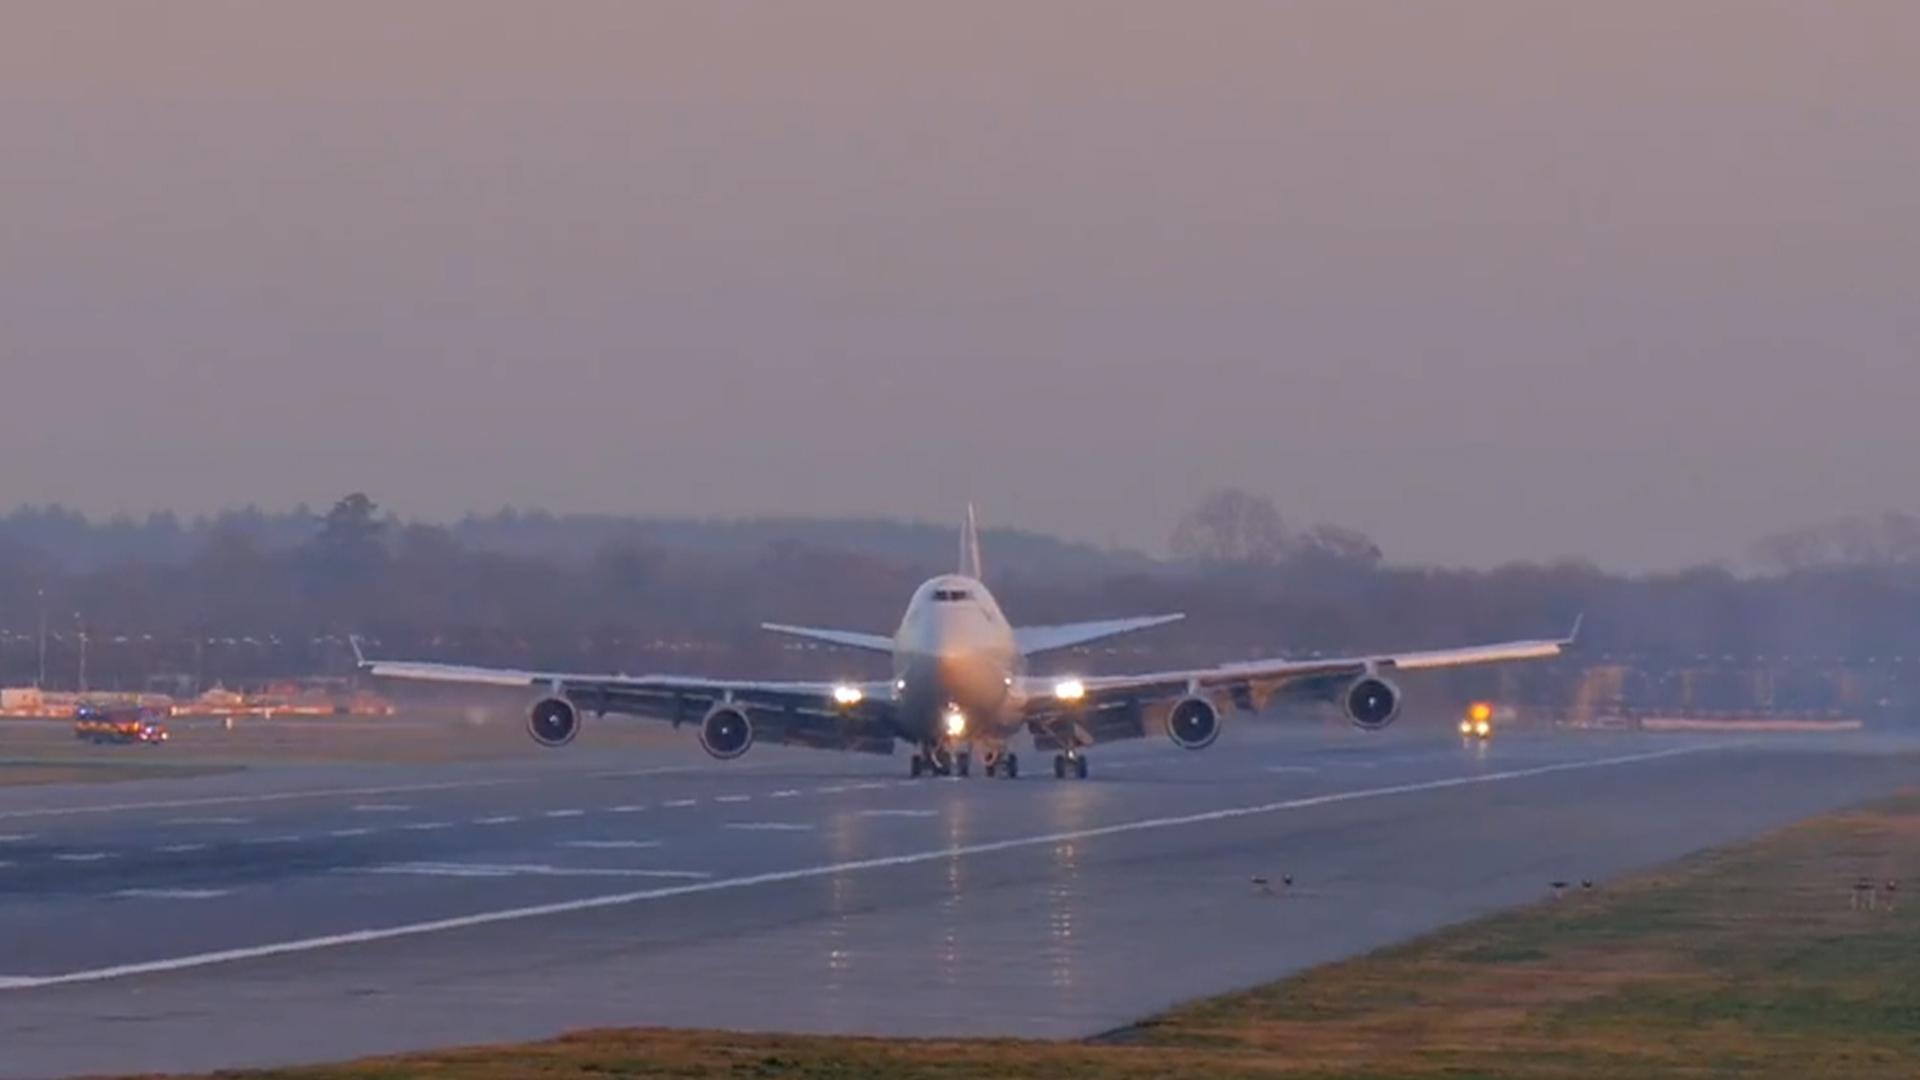 Virgin Atlantic Flight Bound for Las Vegas Makes 'Non-Standard Landing' at Gatwick